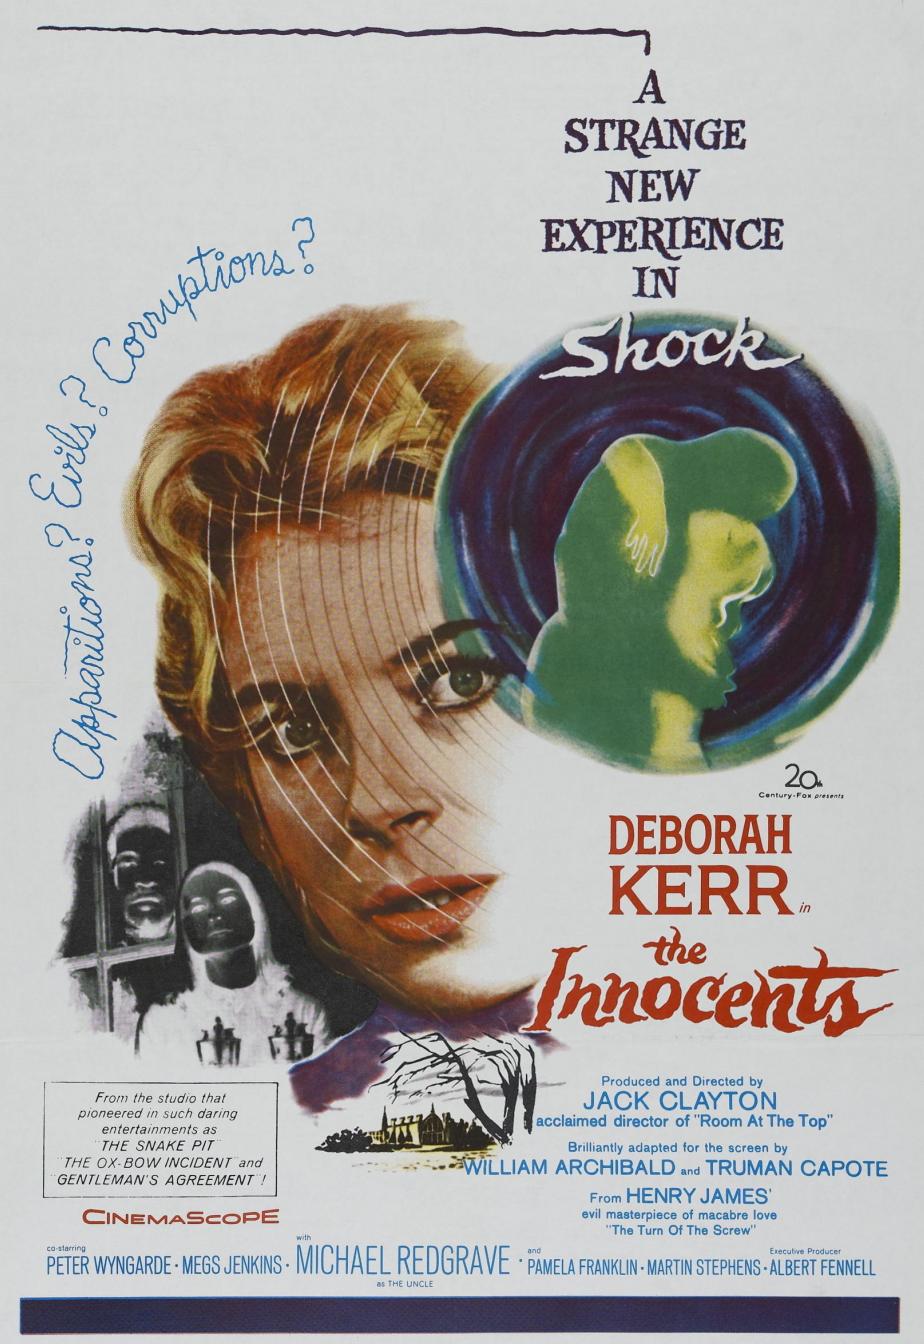 henry-james-the-innocents-starring-deborah-kerr-michael-redgrave-peter-wyngarde-and-megs-jenkins-poster.png